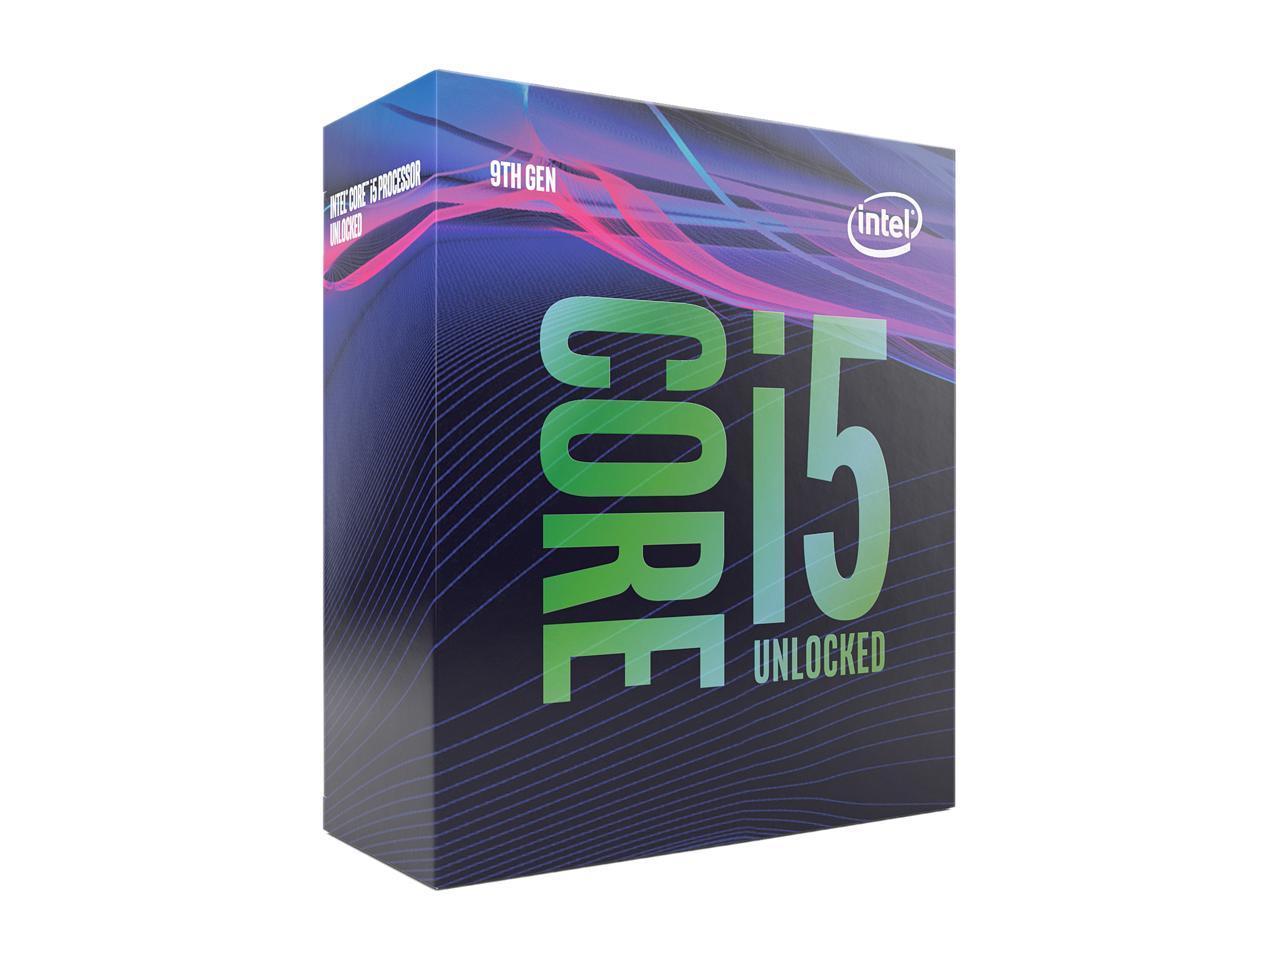 19 117 959 V03